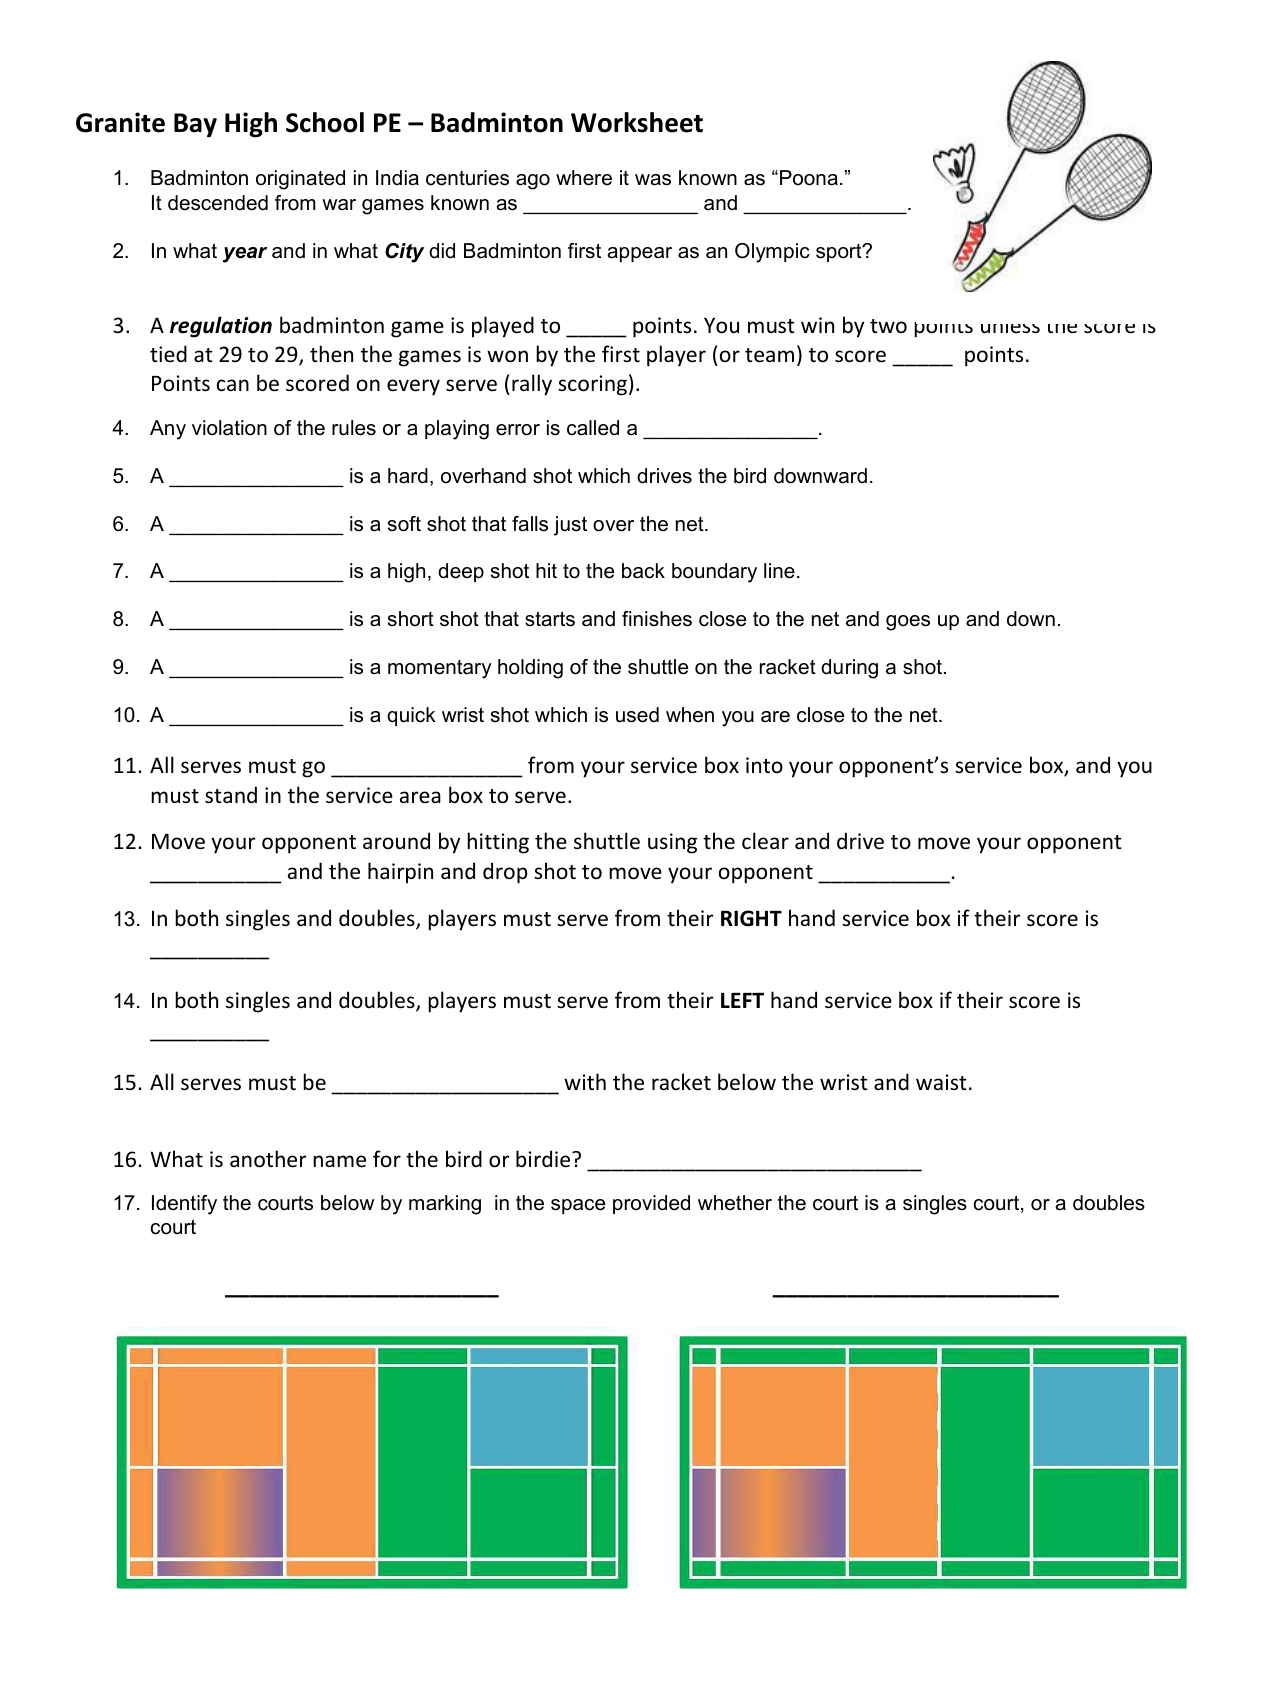 Granite Bay High School Pe Badminton Worksheet